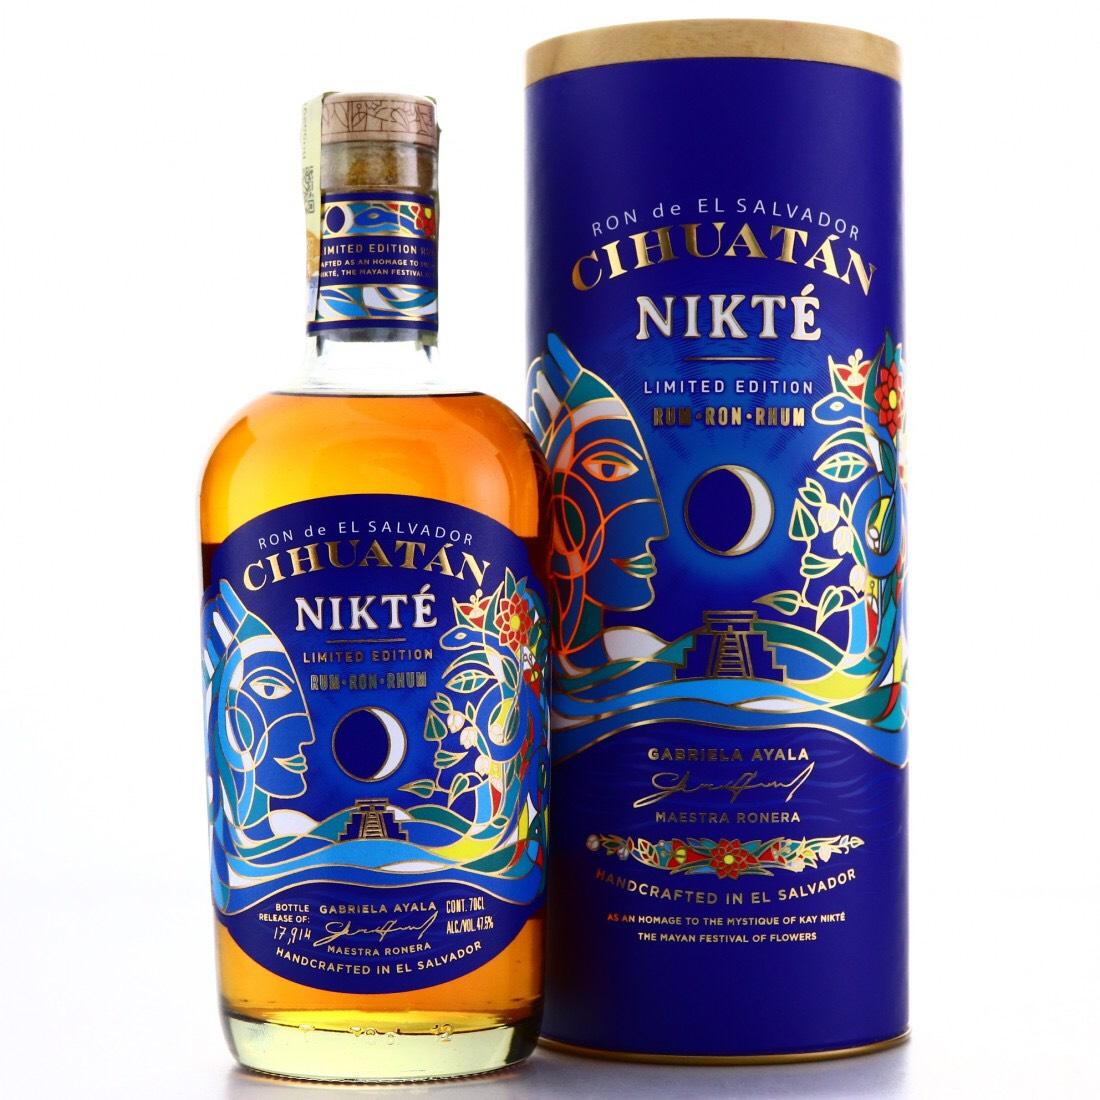 Bottle image of Nikté Limited Edition